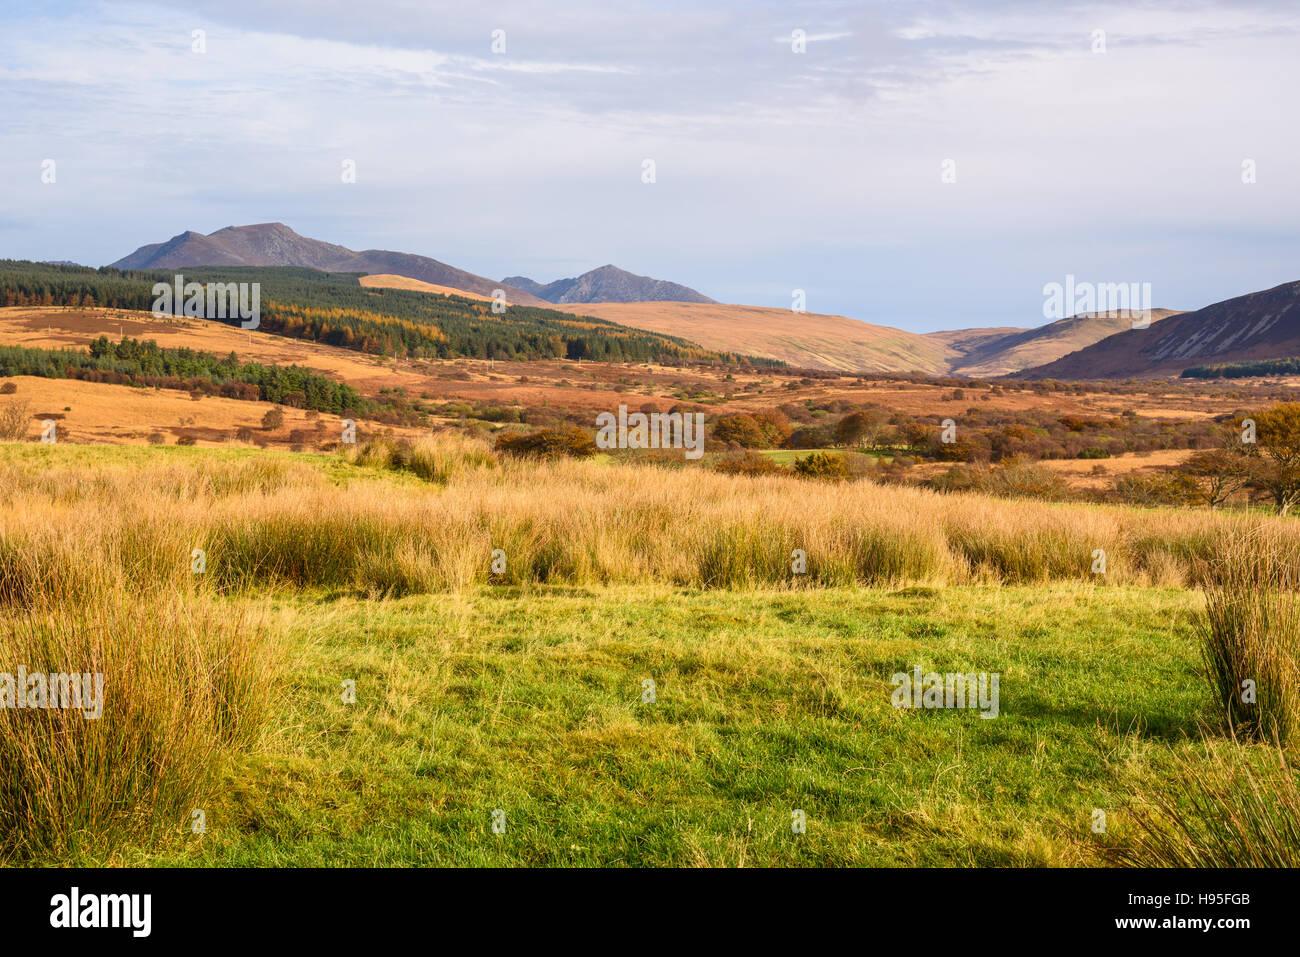 Machrie Moor, Isle of Arran, North Ayrshire, Scotland - Stock Image